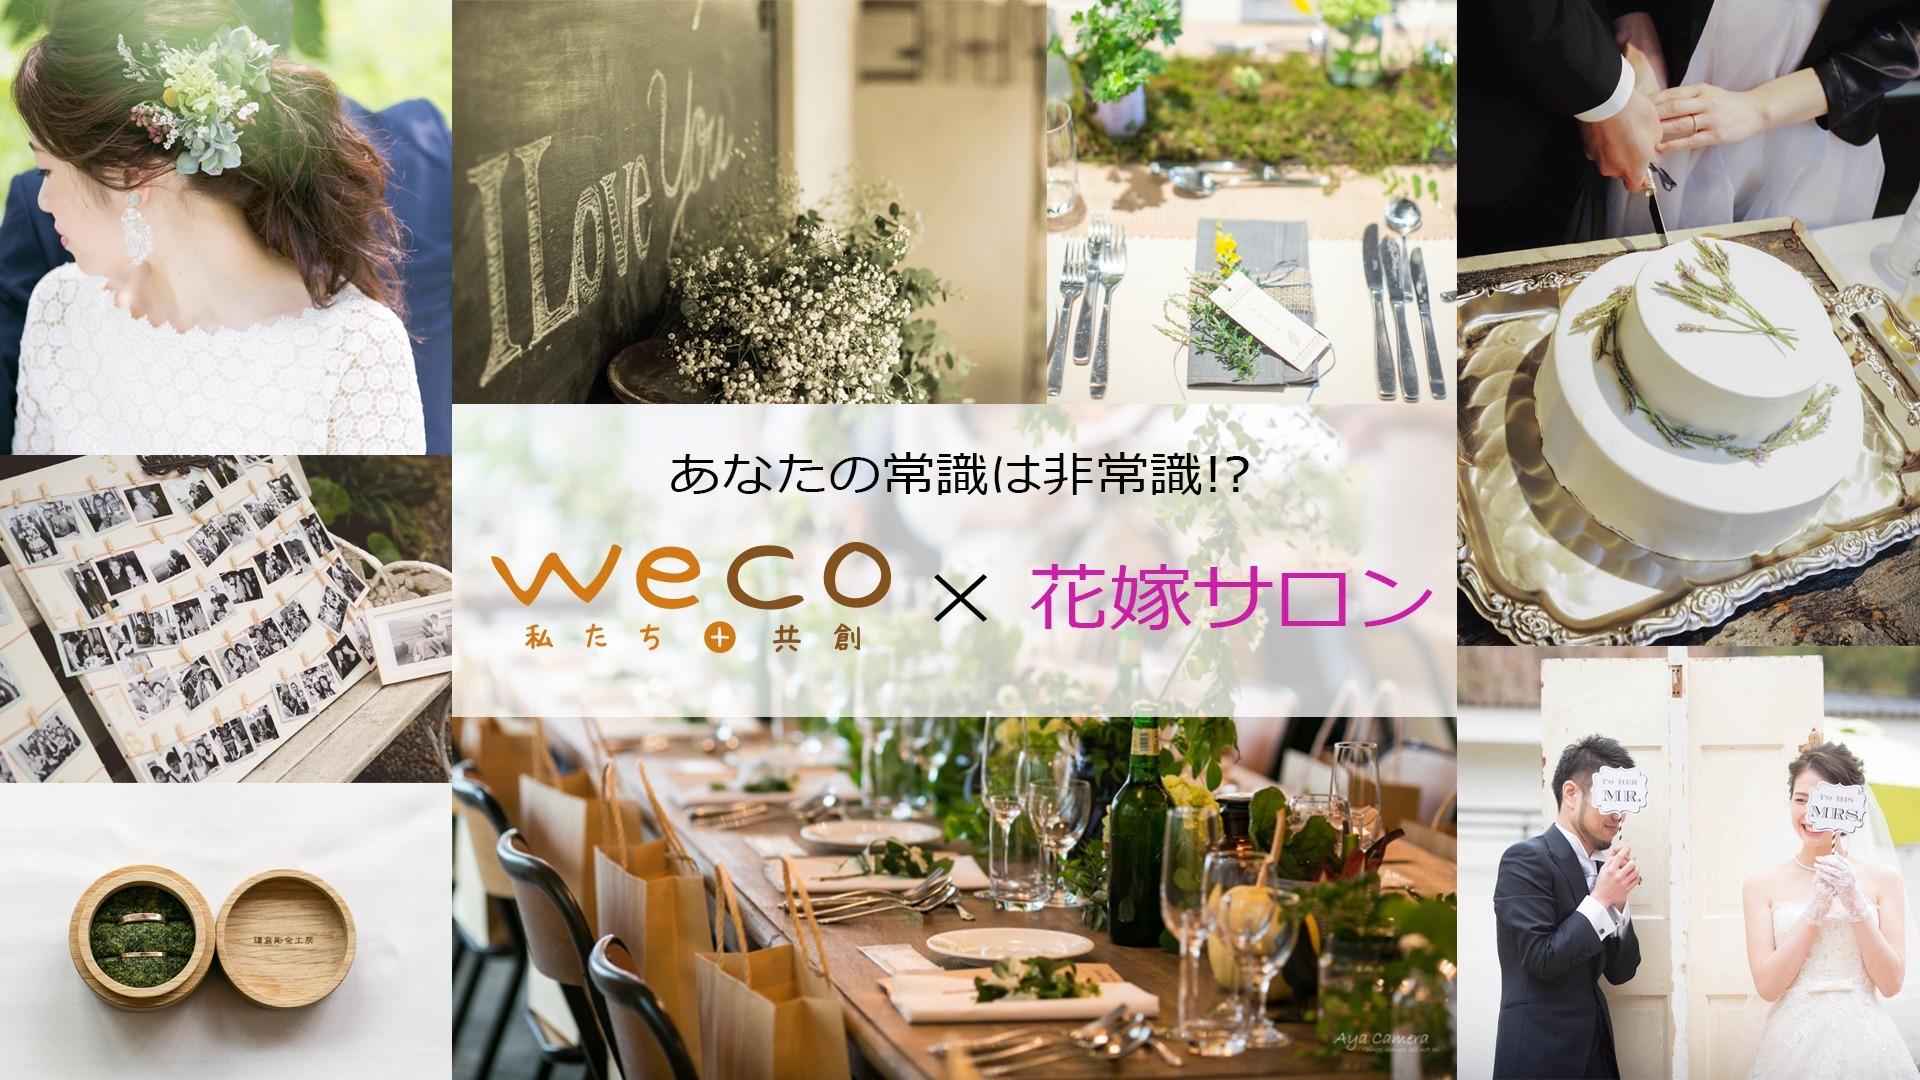 weco(ウェコ)編集長 高橋康博 - 結婚準備サポートサロン|ここでしか公開しない本当に役立つプロの知恵 - DMM オンラインサロン